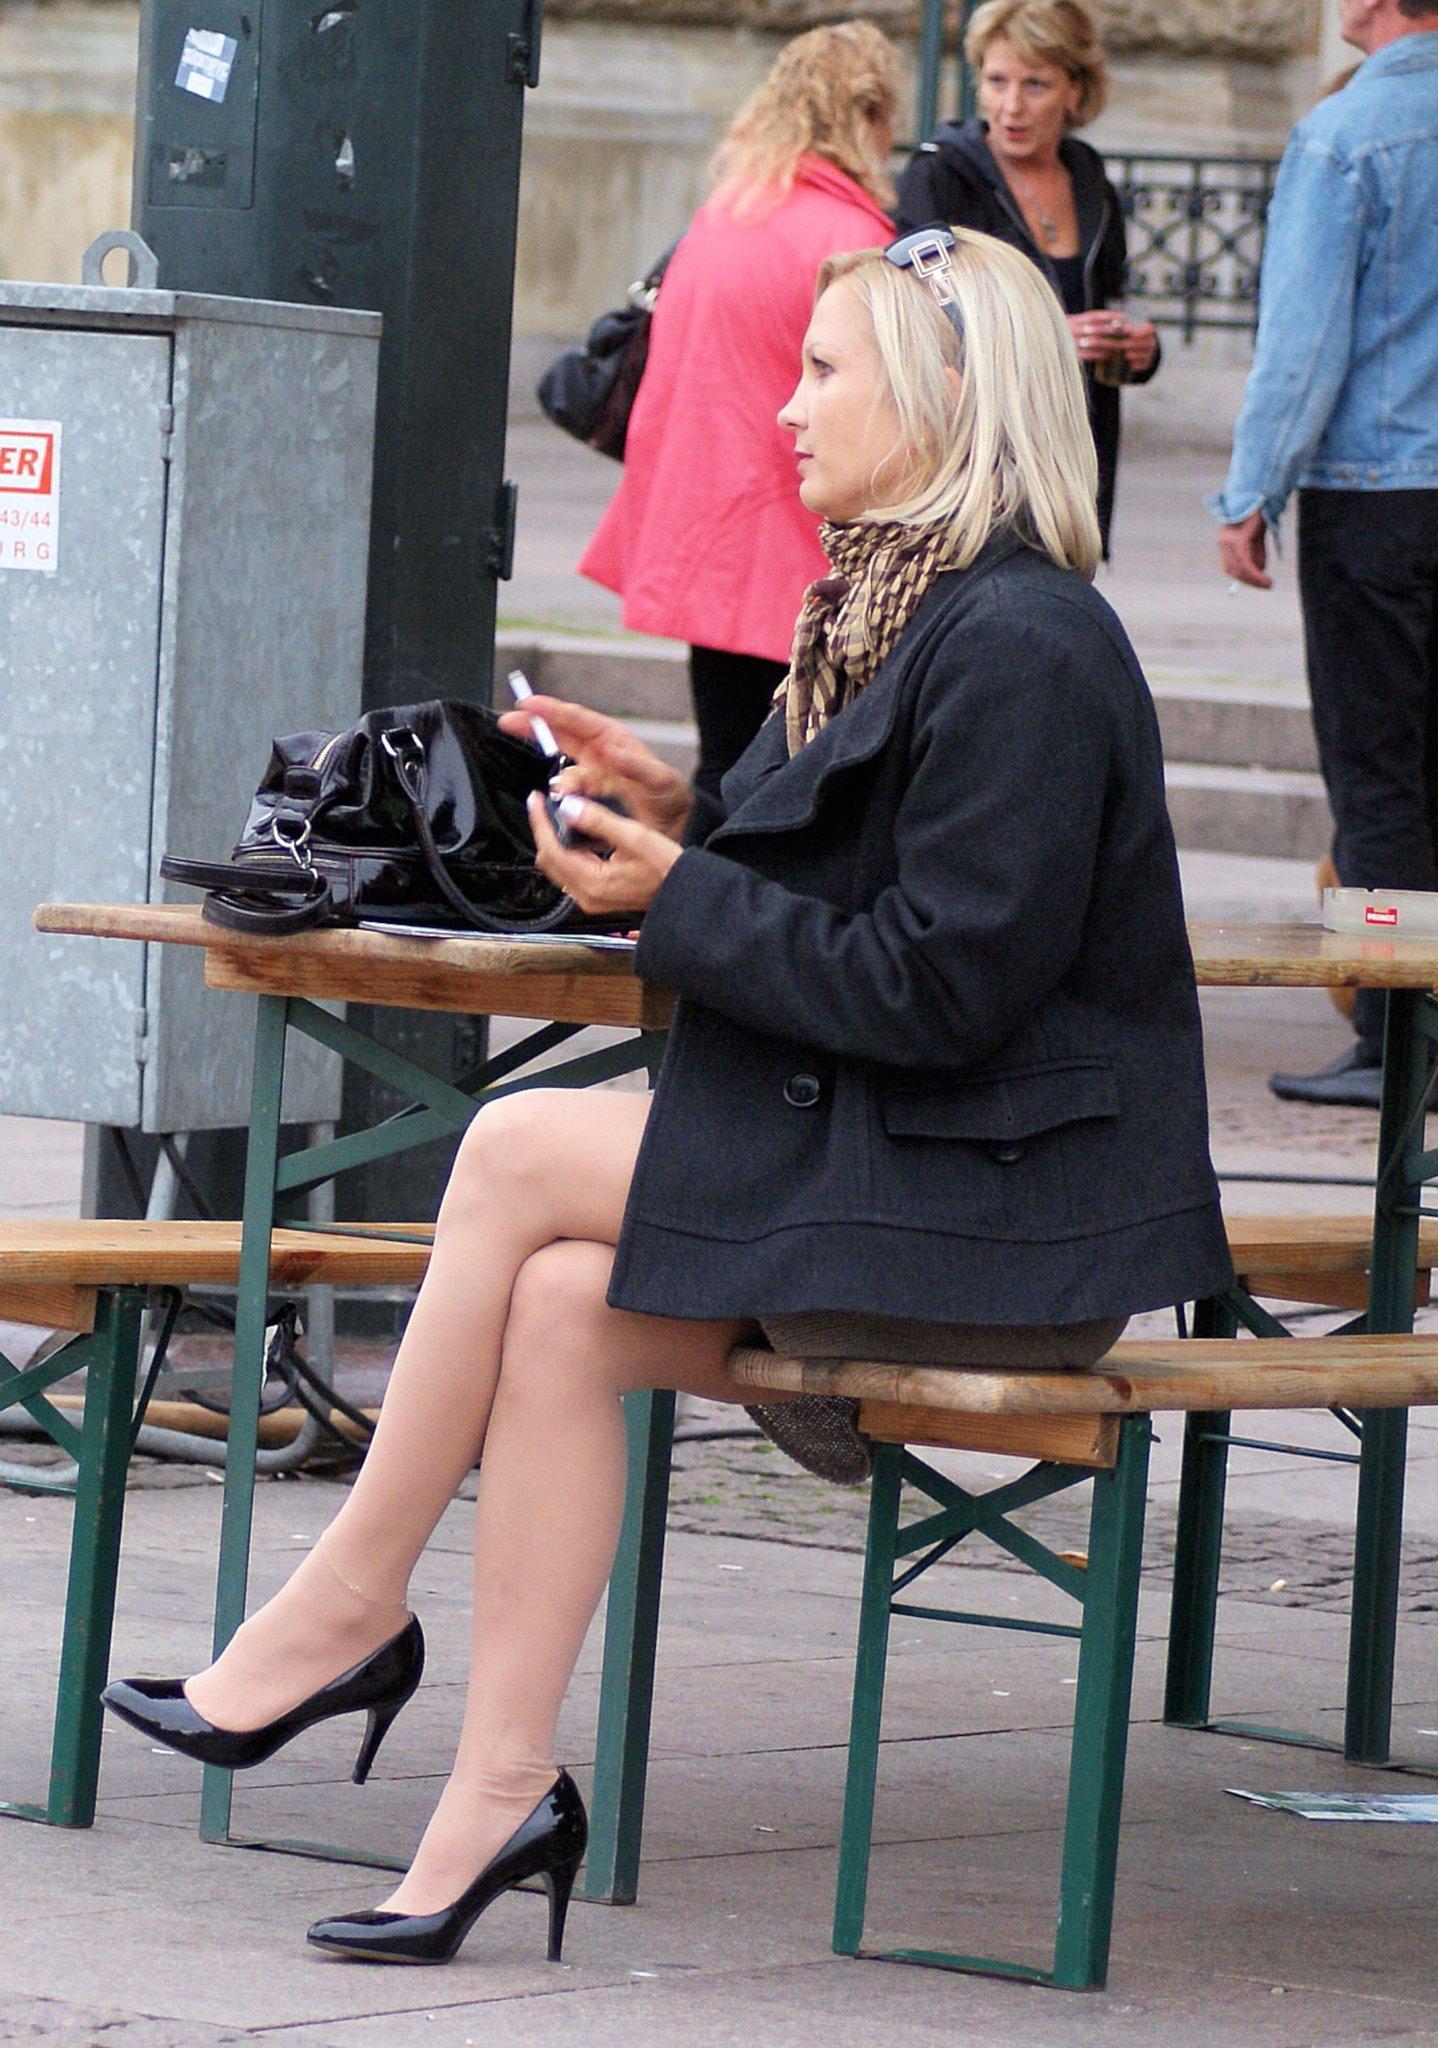 Candid Legs on Twitter: Mature Woman Wearing Black